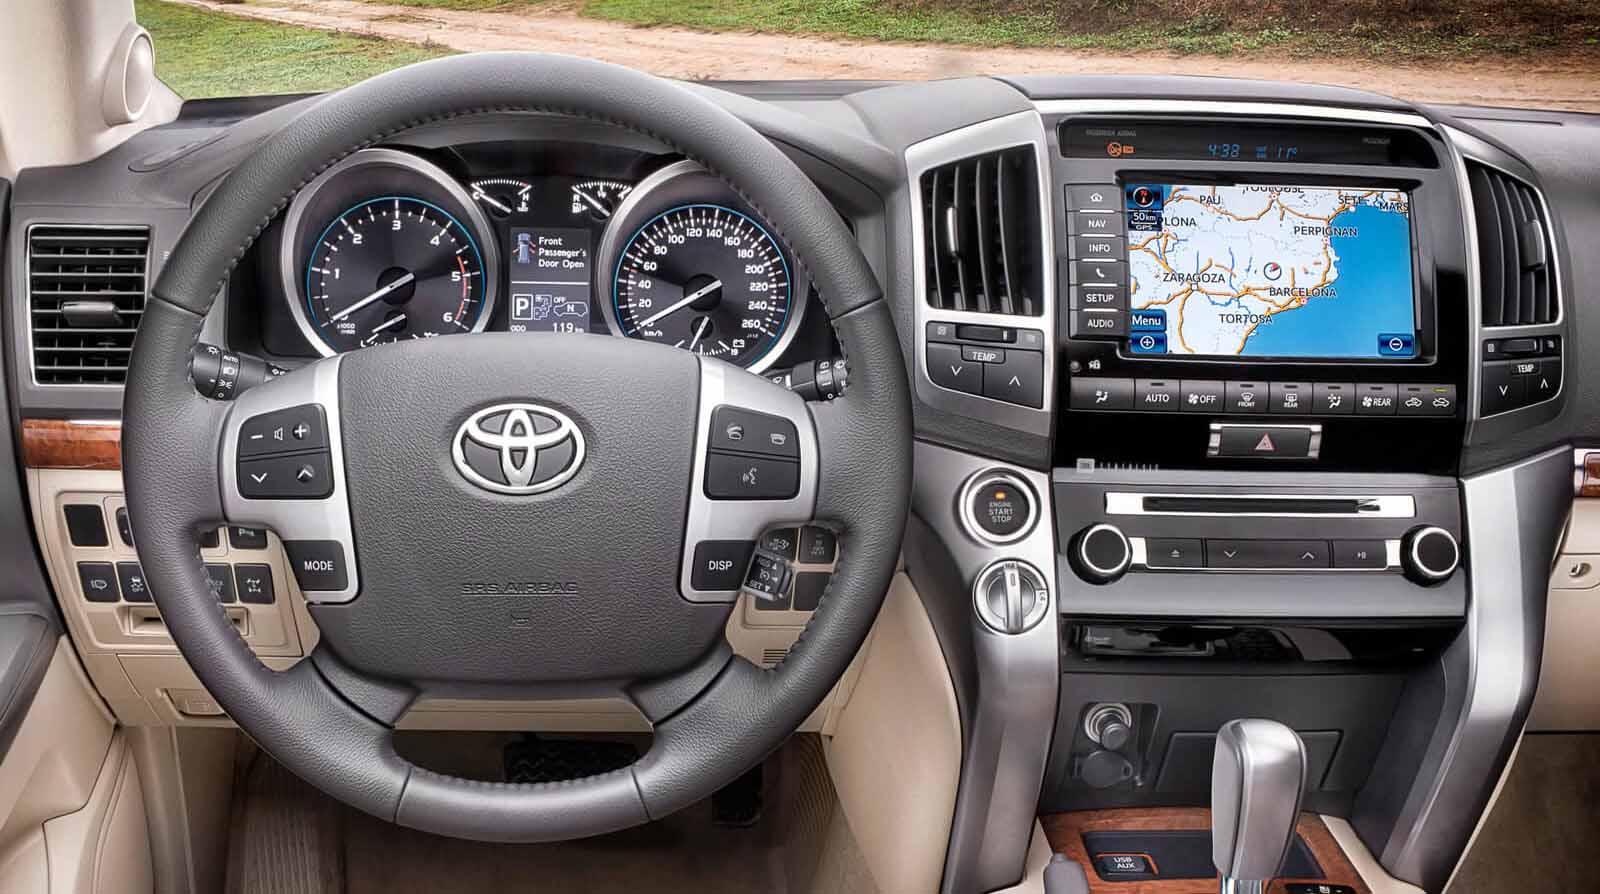 Toyota Land Cruiser head unit